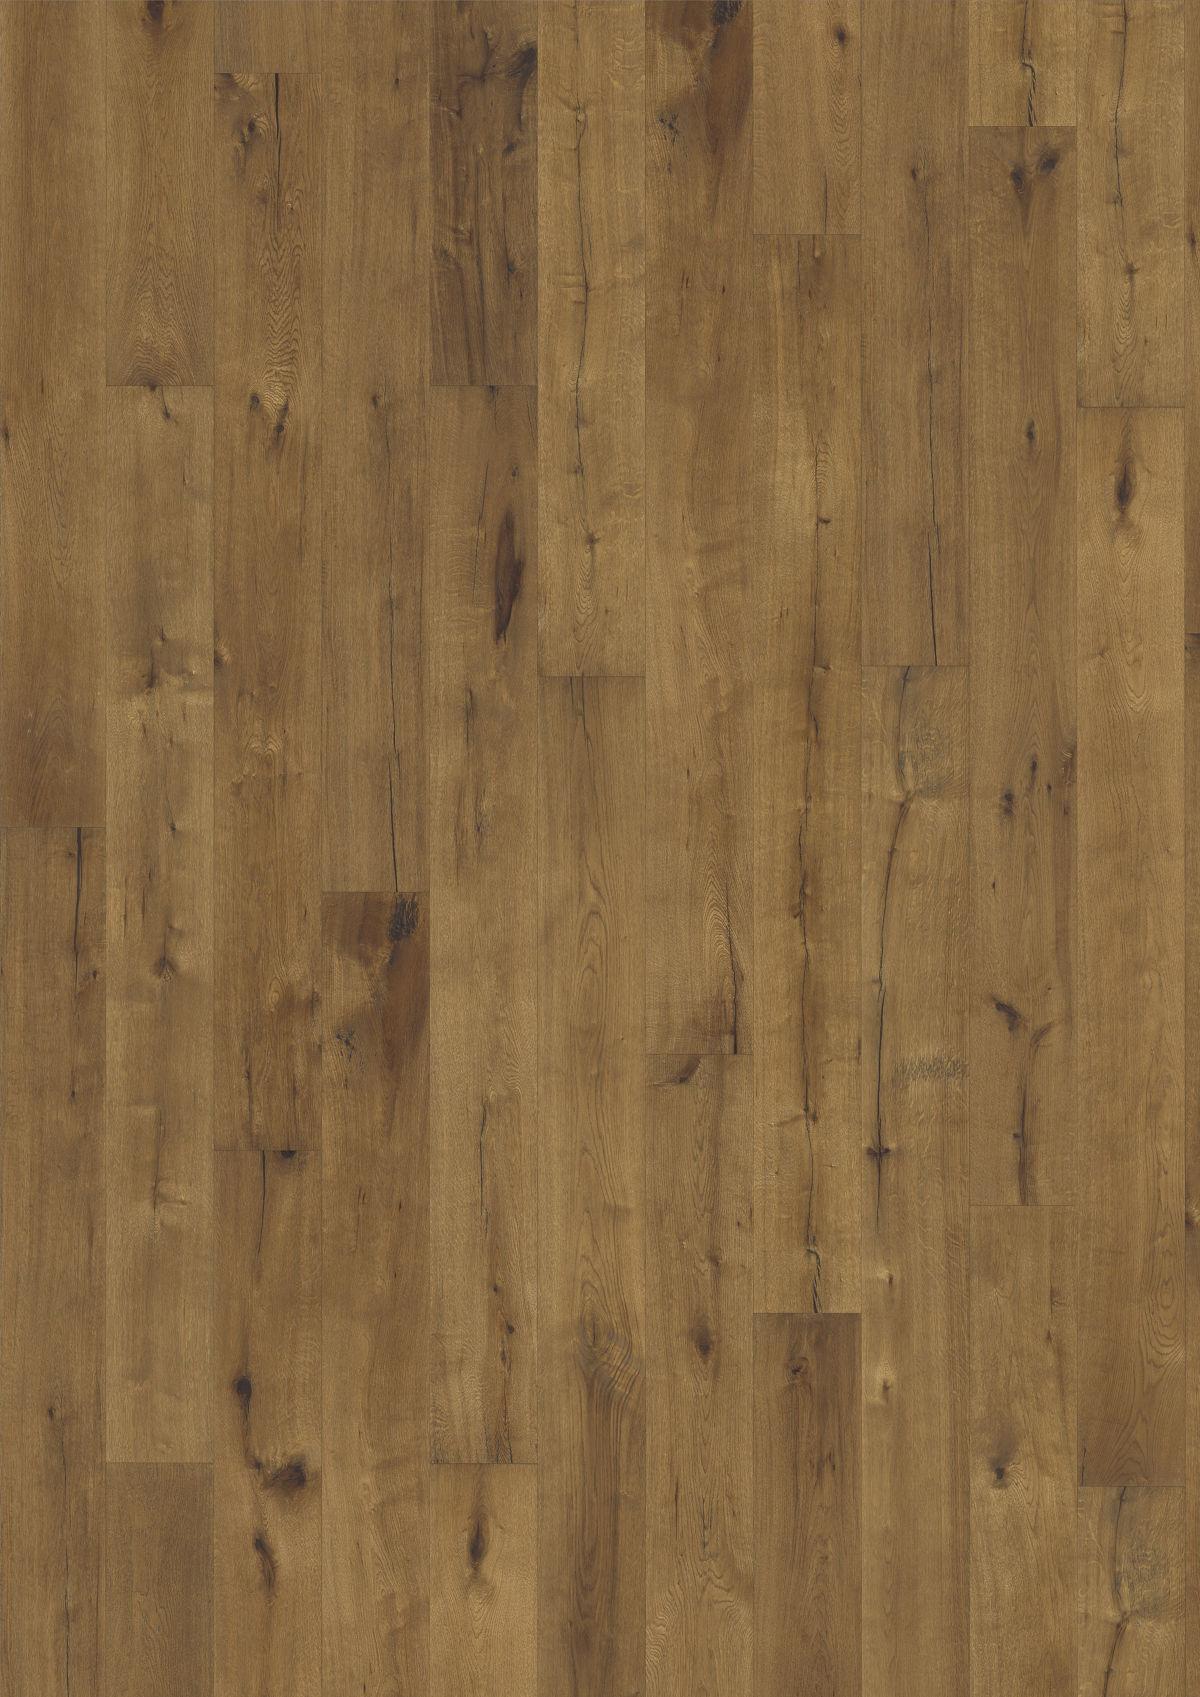 Kahrs Artisan Oak Tan Engineered Wood Flooring